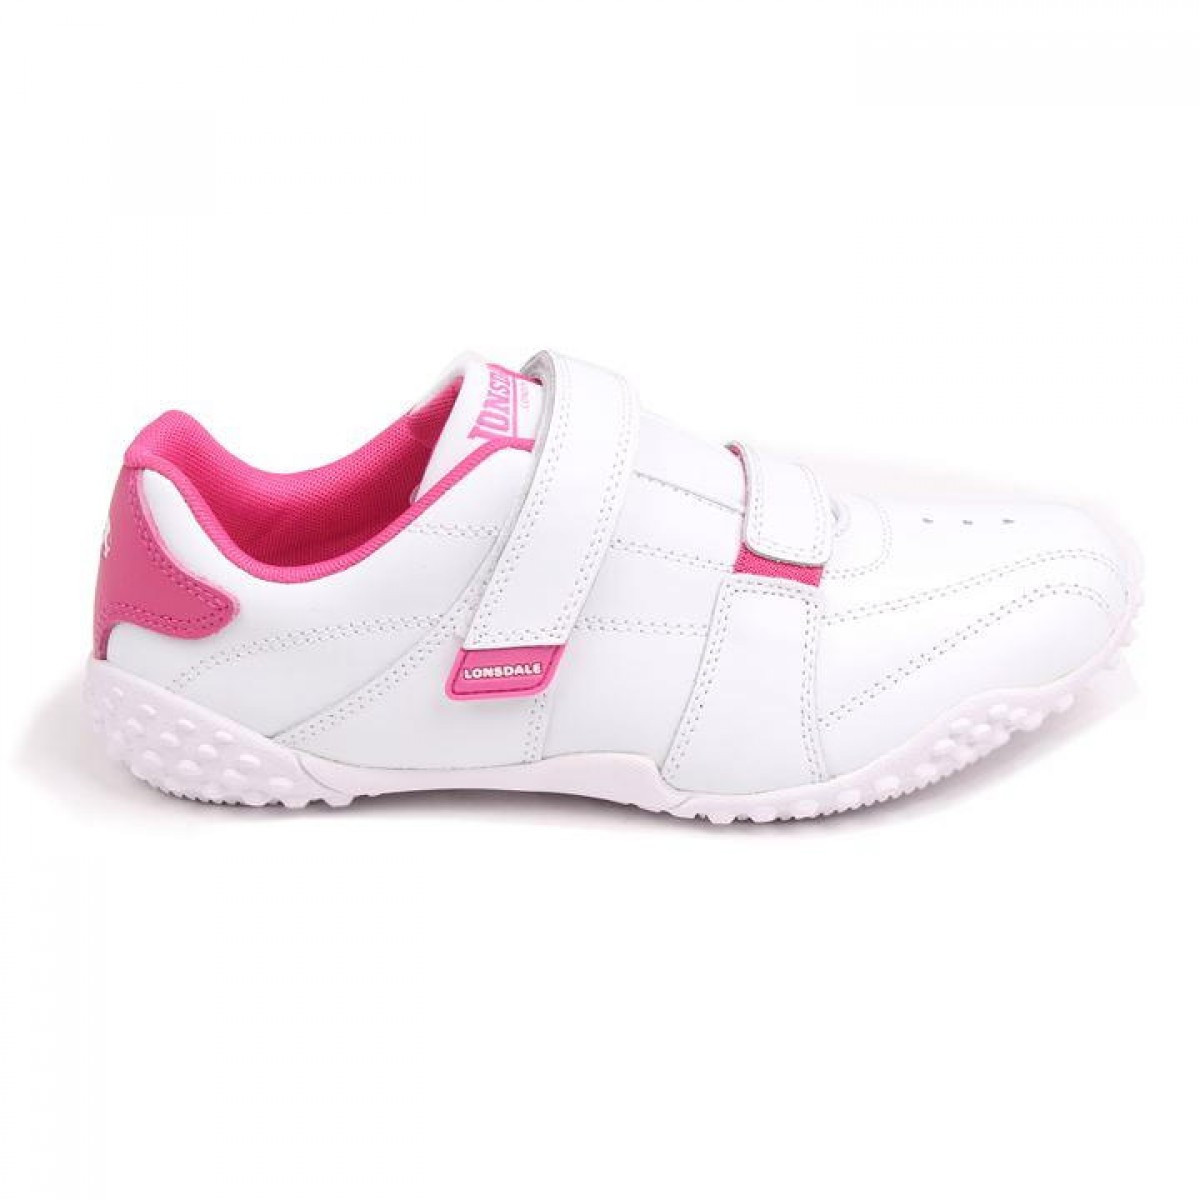 Кроссовки Lonsdale Fulham White/Pink - Оригинал, фото 1